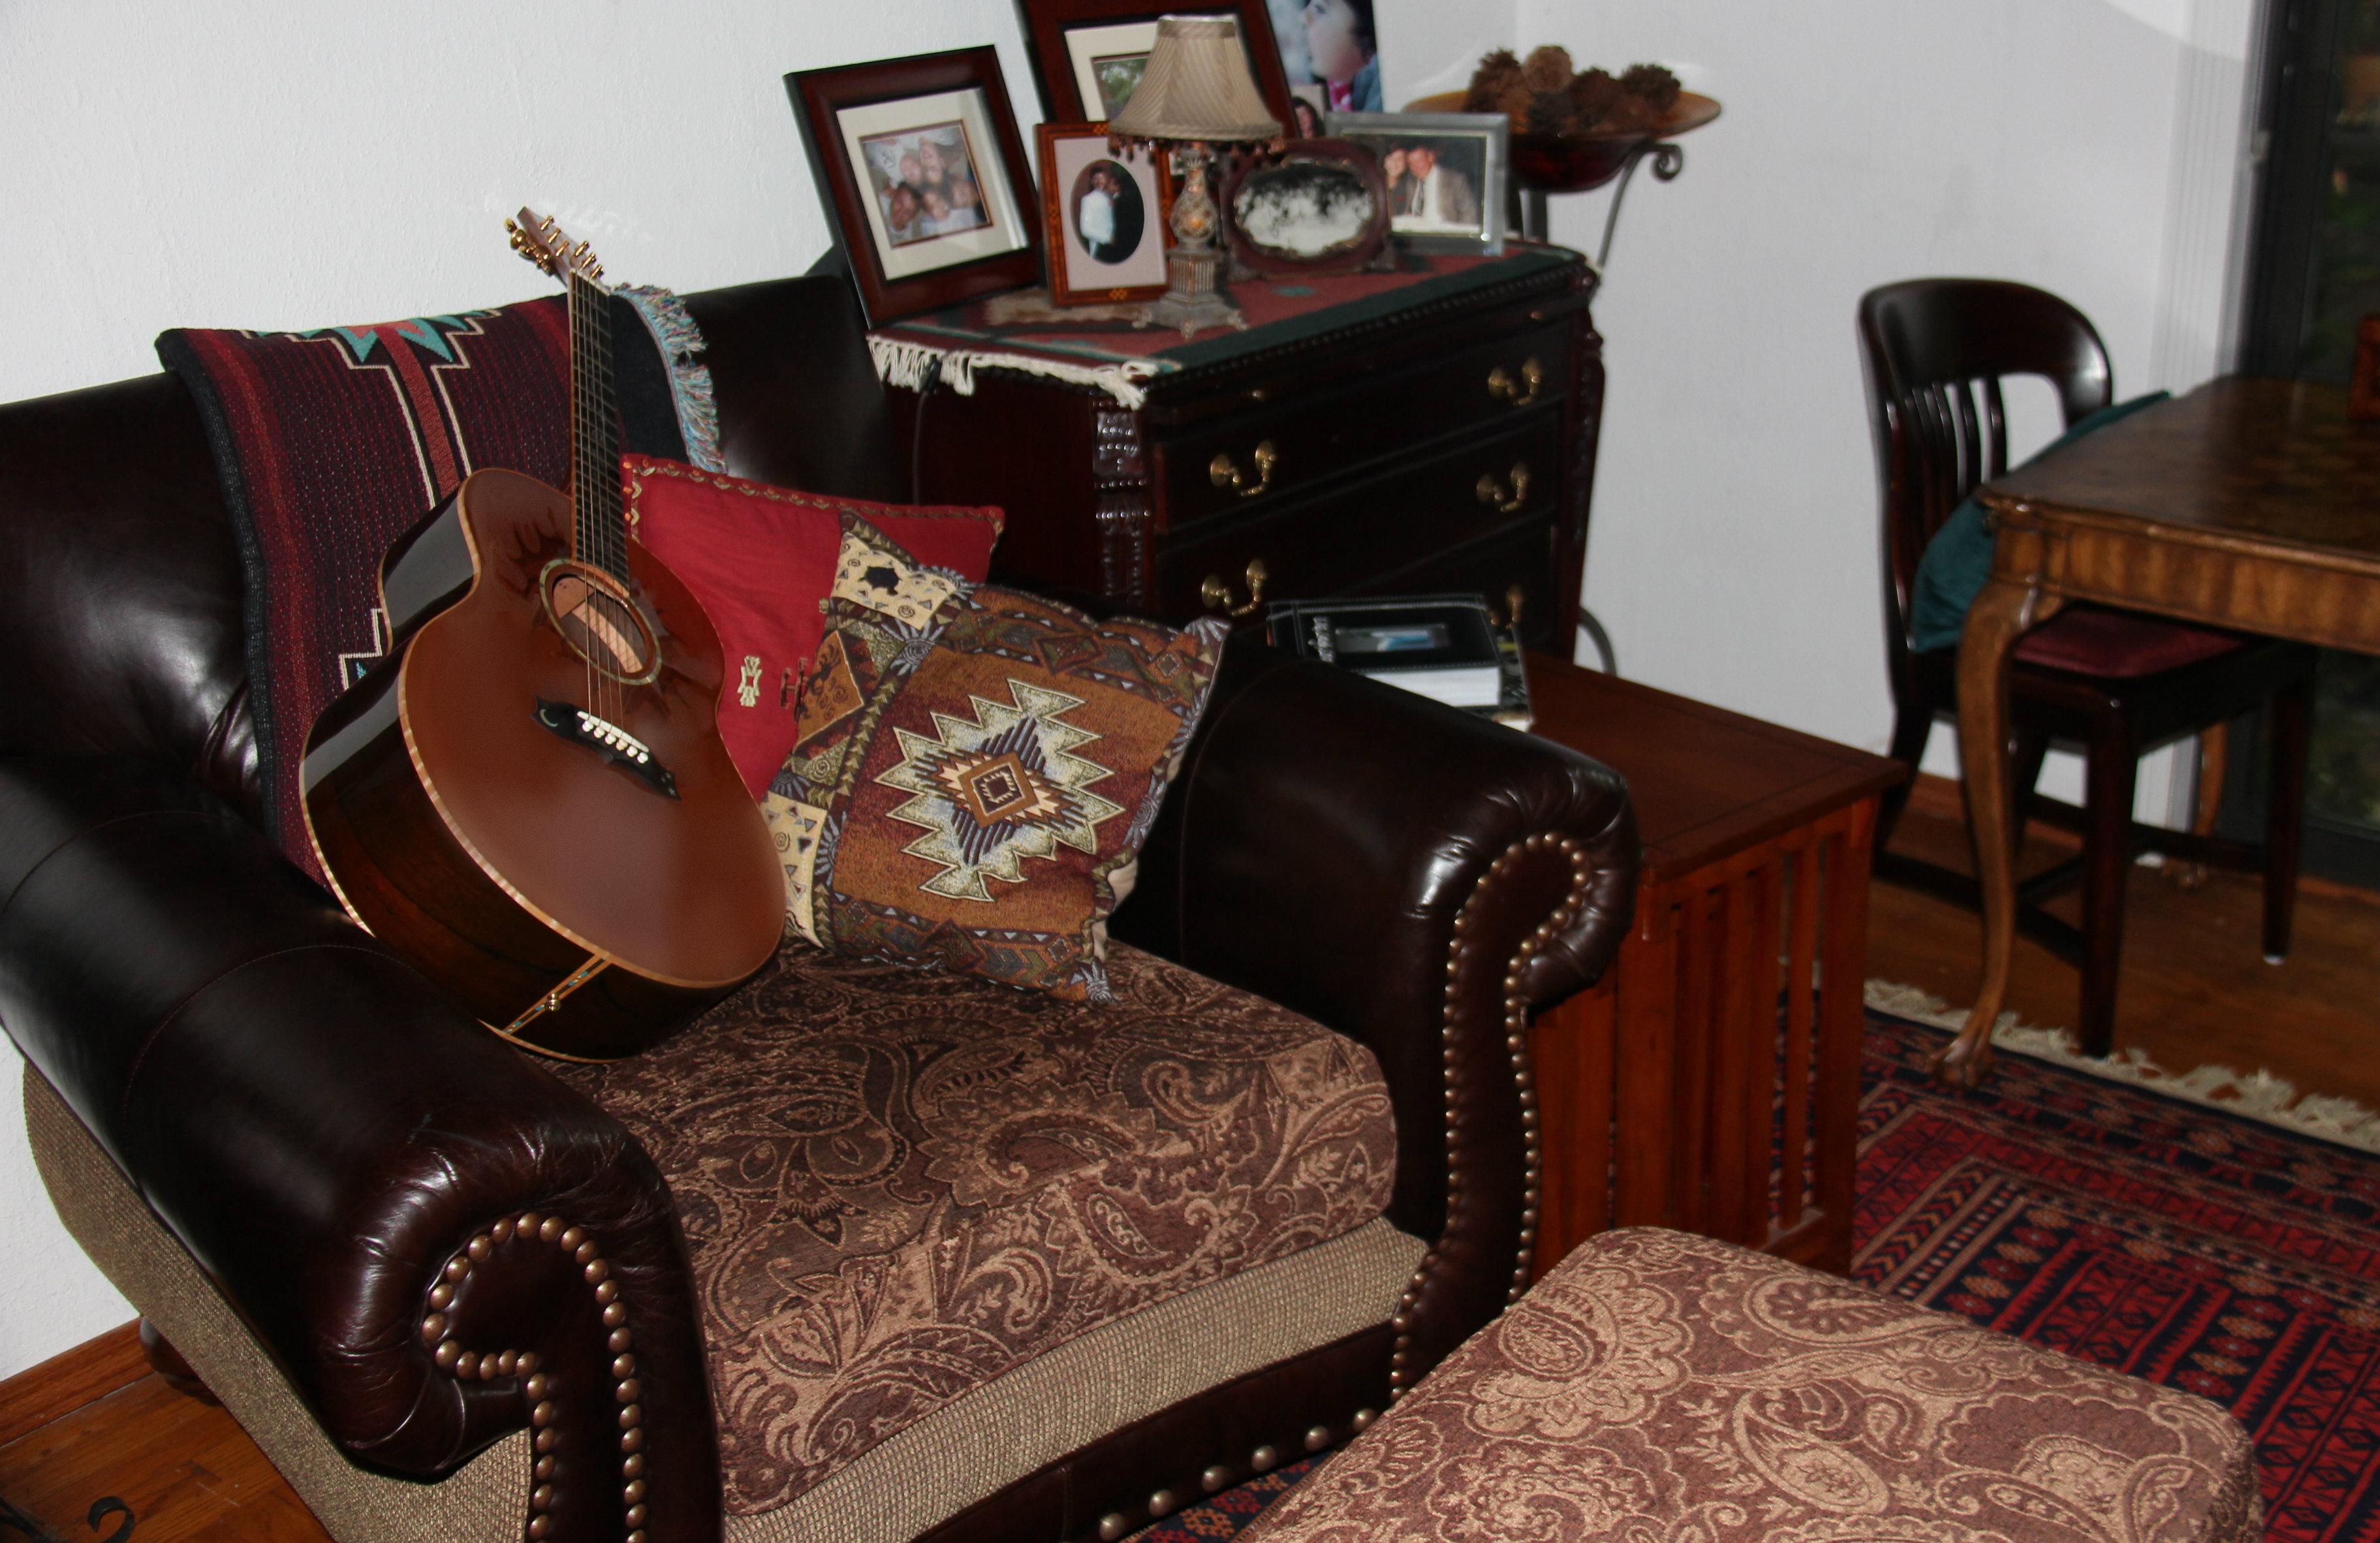 Hintergrundbilder : Gitarre, Tabelle, Musik-, Couch, Sessel, Rose ...